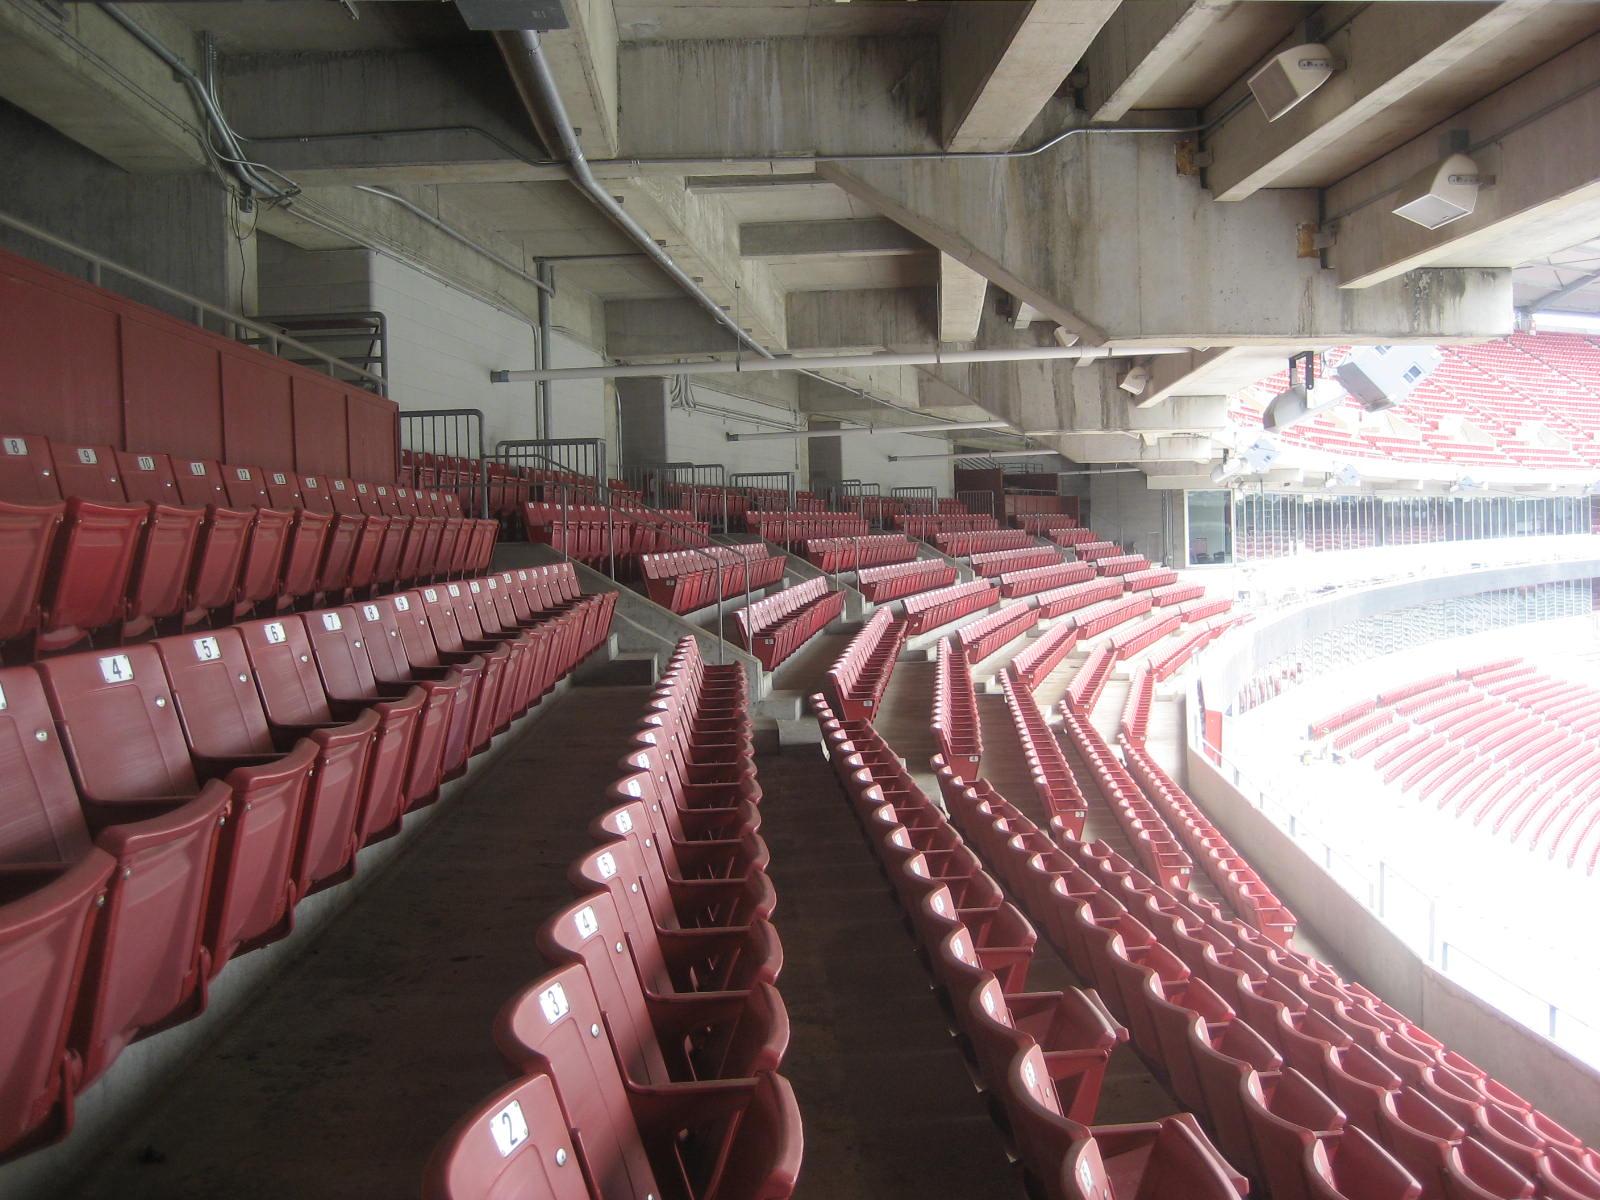 Bryant Denny Stadium Alabama Seating Guide Rateyourseatscom